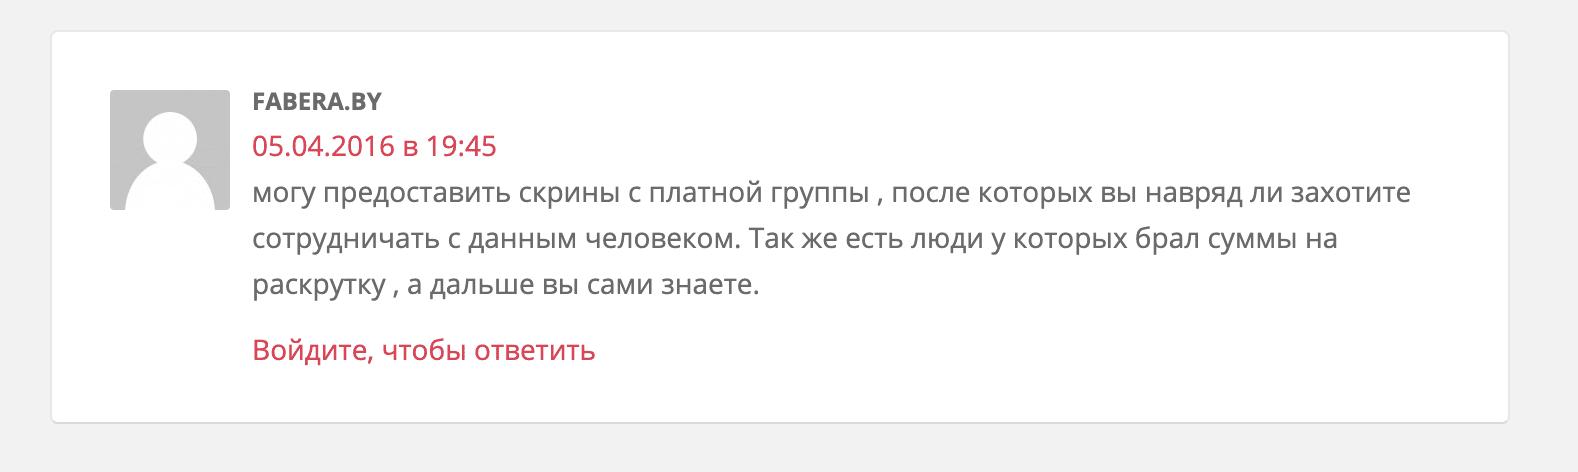 Отзывы о Василие Ефимове (основателе Best Capper In Live)